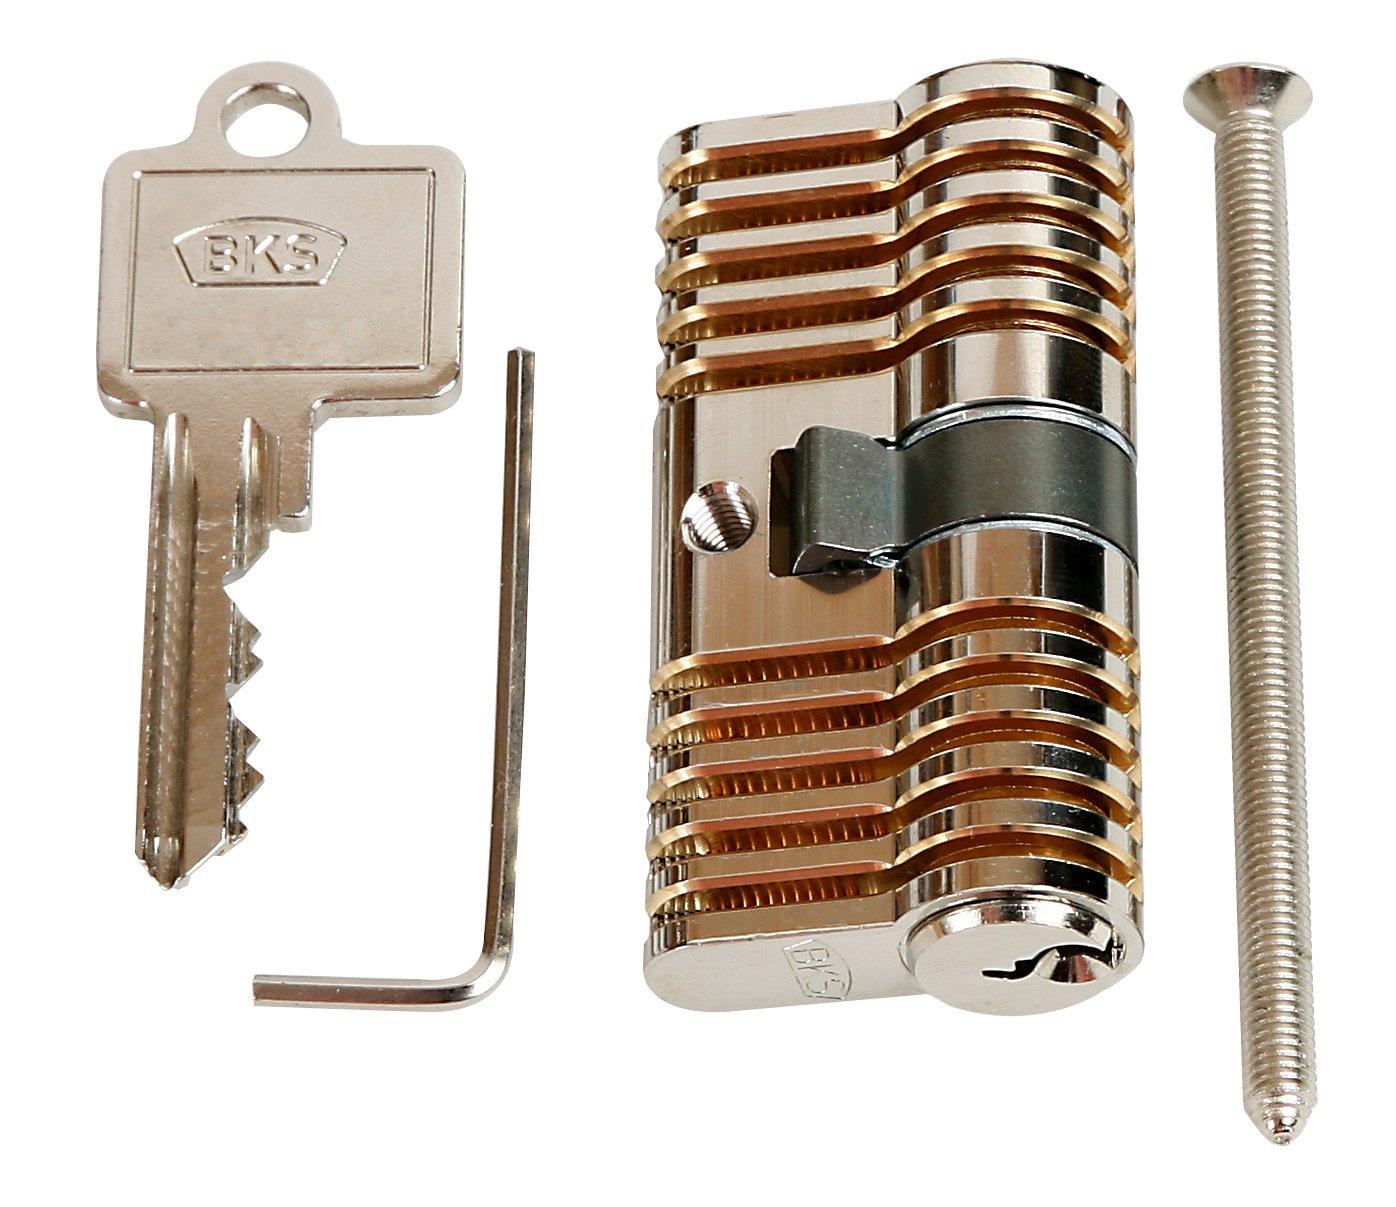 Cerradura cil/índrica Multipick/MK2 30//30 para pr/áctica con ganz/úas